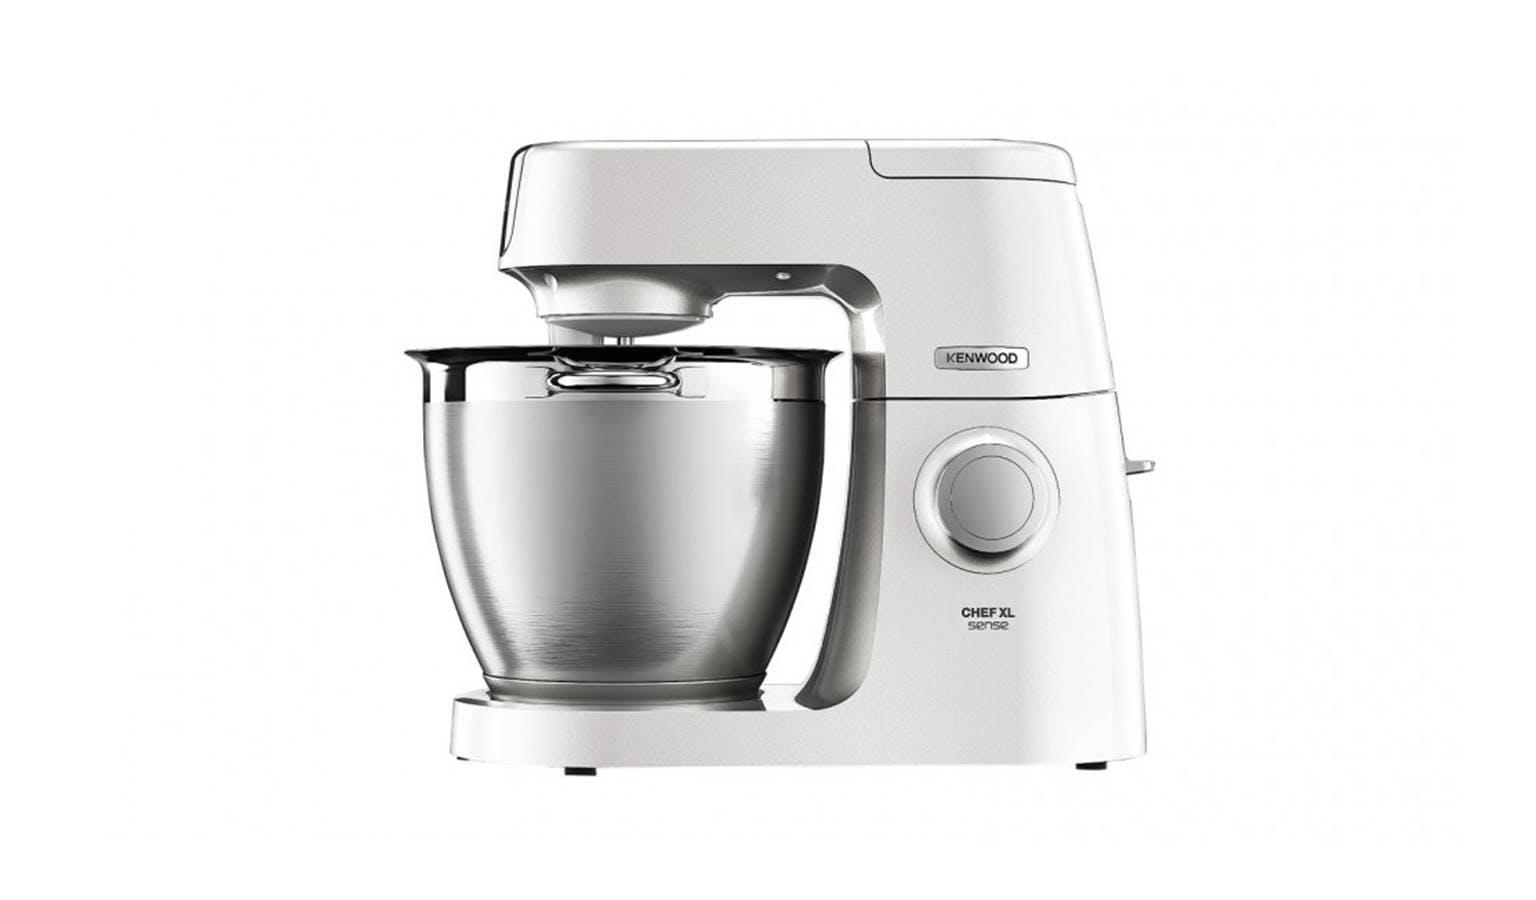 Kenwood Kql6300 Chef Xl Sense Kitchen Machine Ivory